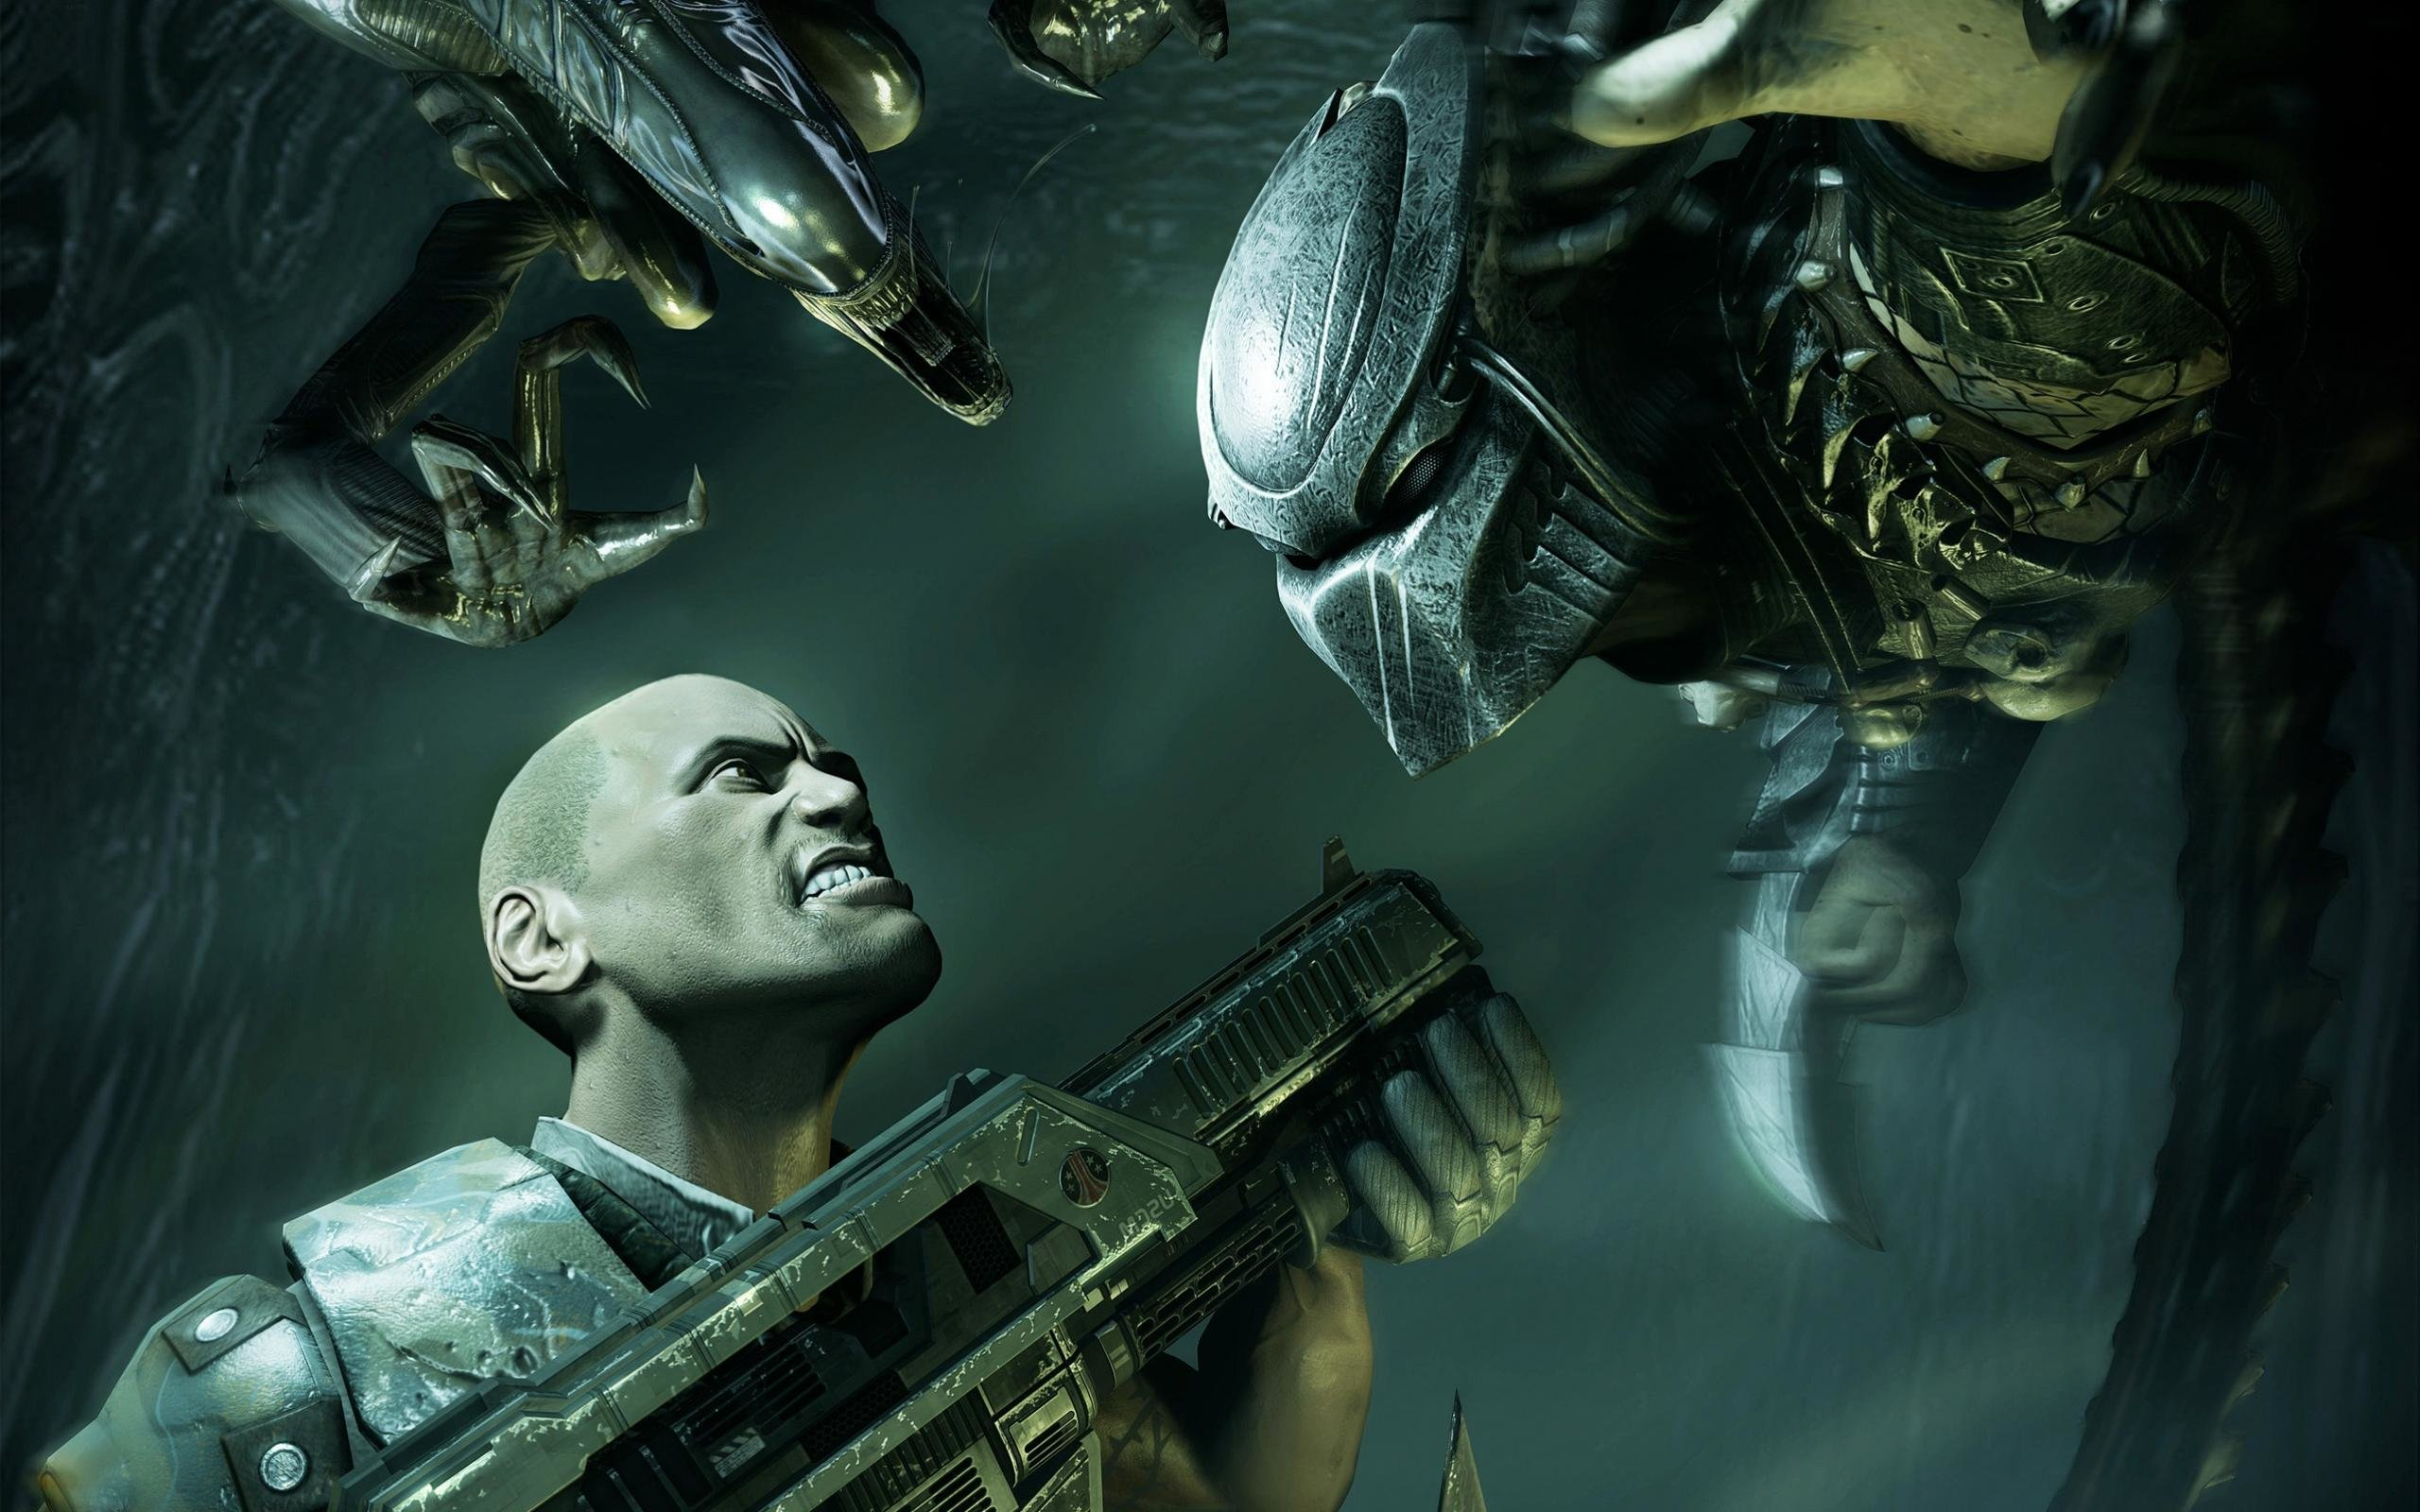 Aliens Vs Predator Wallpapers Hd For Desktop Backgrounds